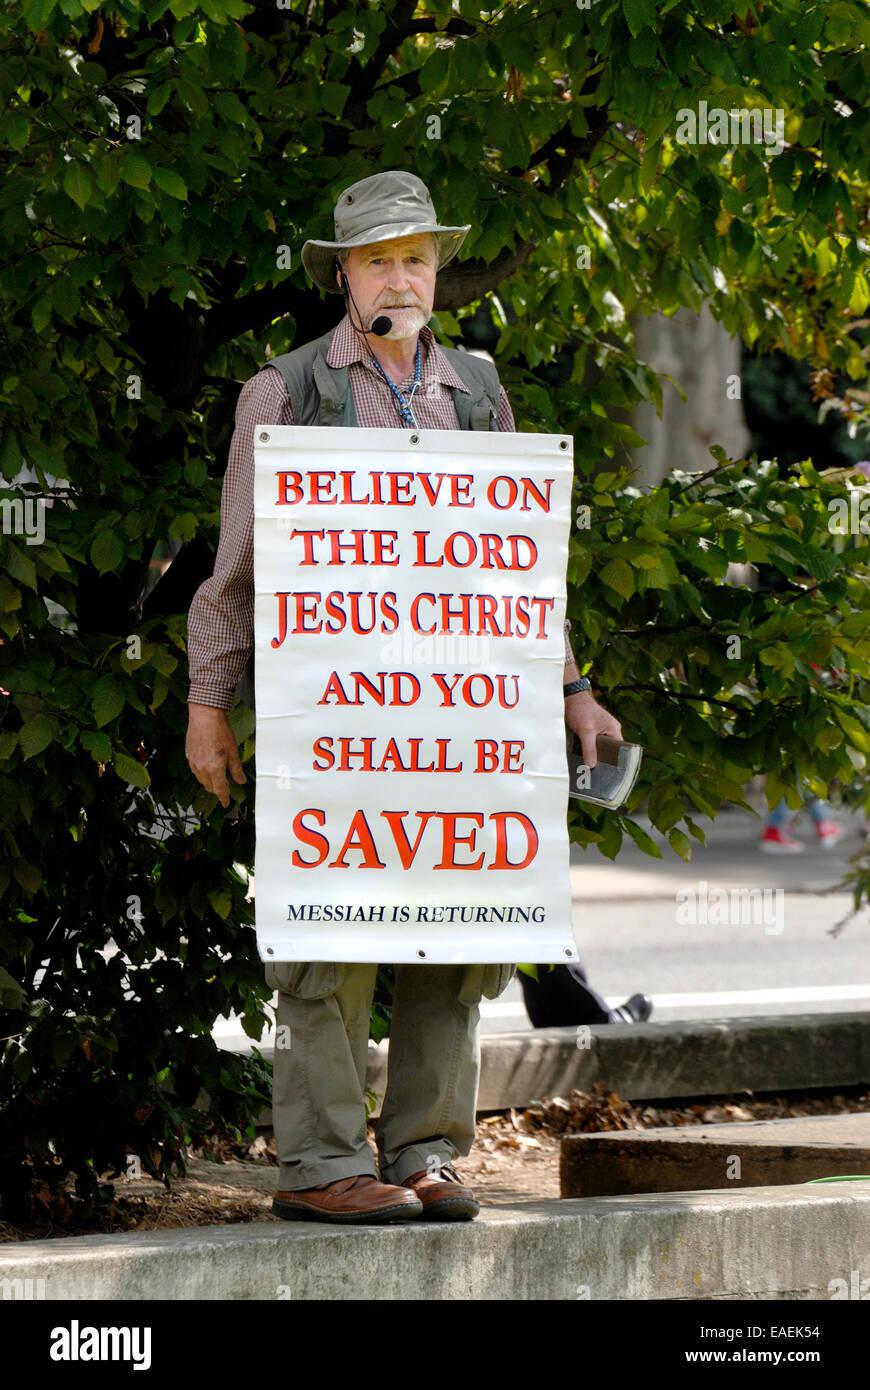 Westminster, London, England, UK. Religiöse Demonstrant gegen Vorgehen gegen Syrien. 29. August 2013, London. Stockbild